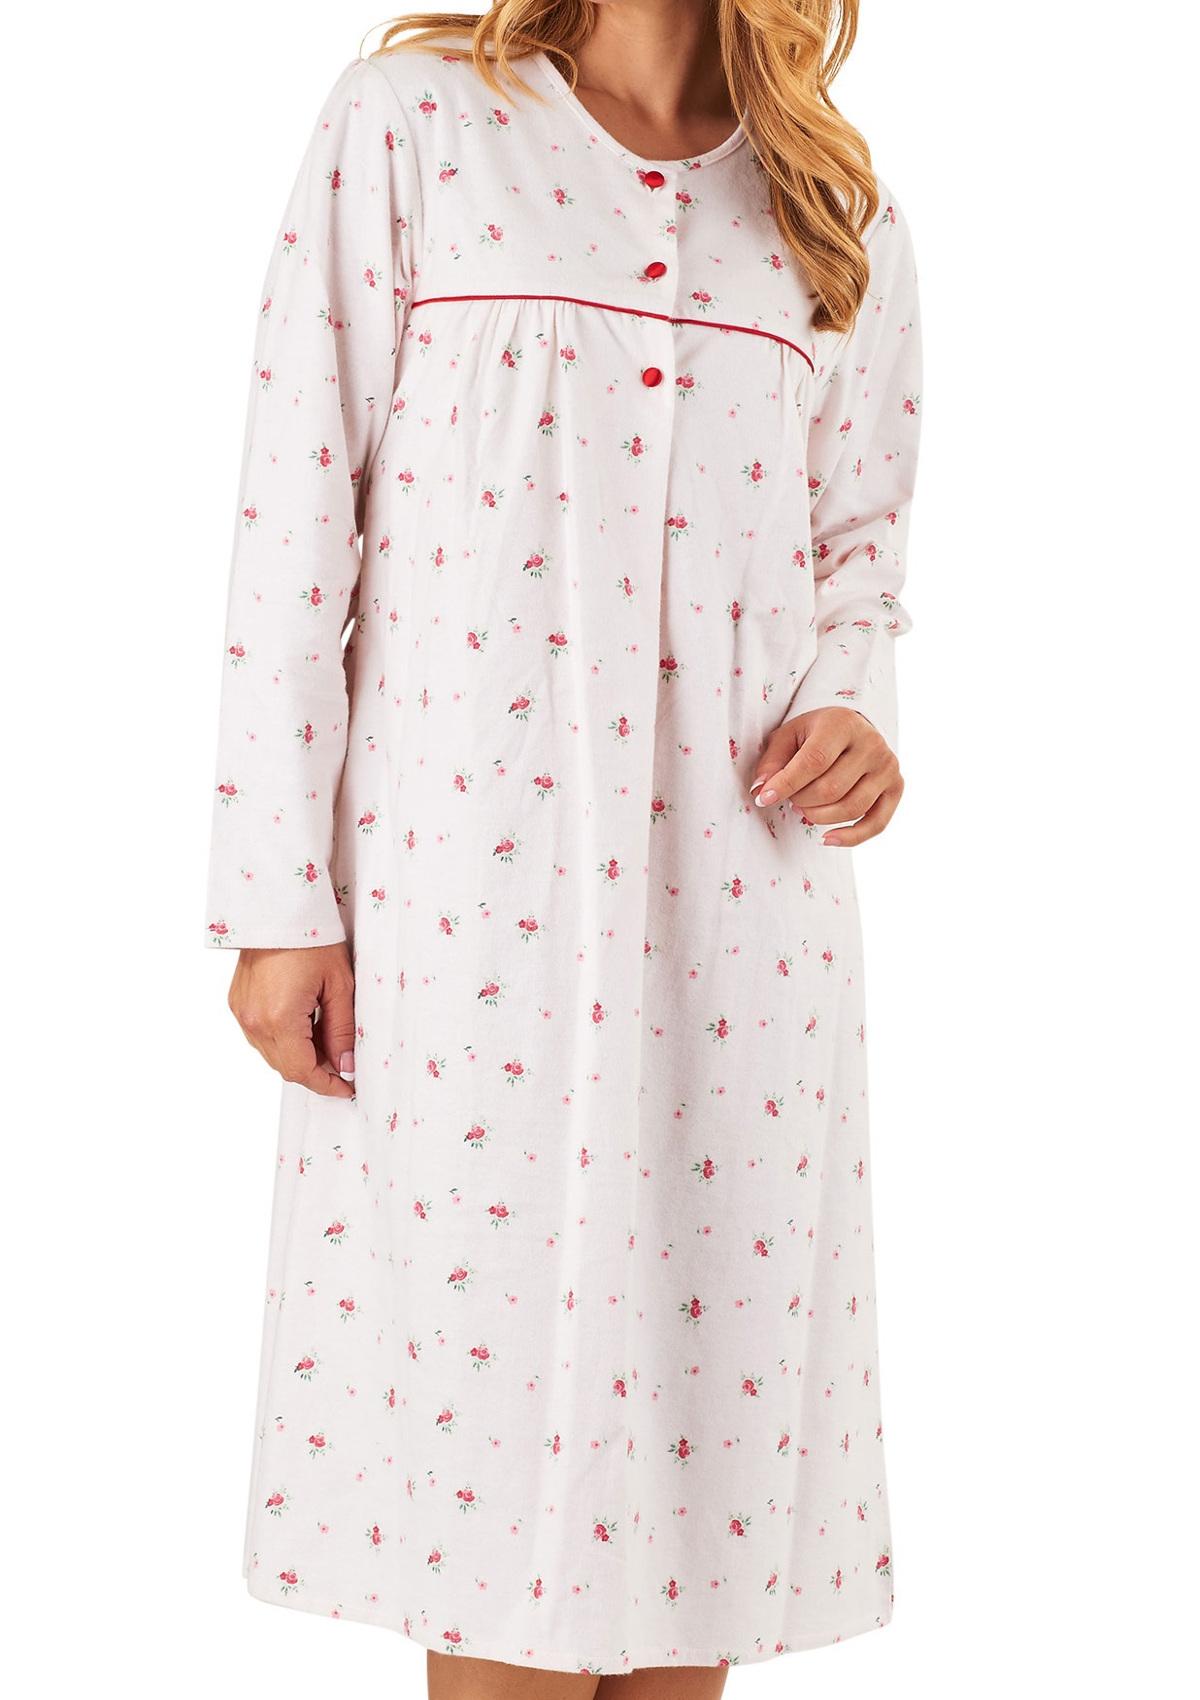 c5f97d2d9e Nightdress Womens Long Sleeved Floral 100% Cotton Flannel Nightie  Slenderella